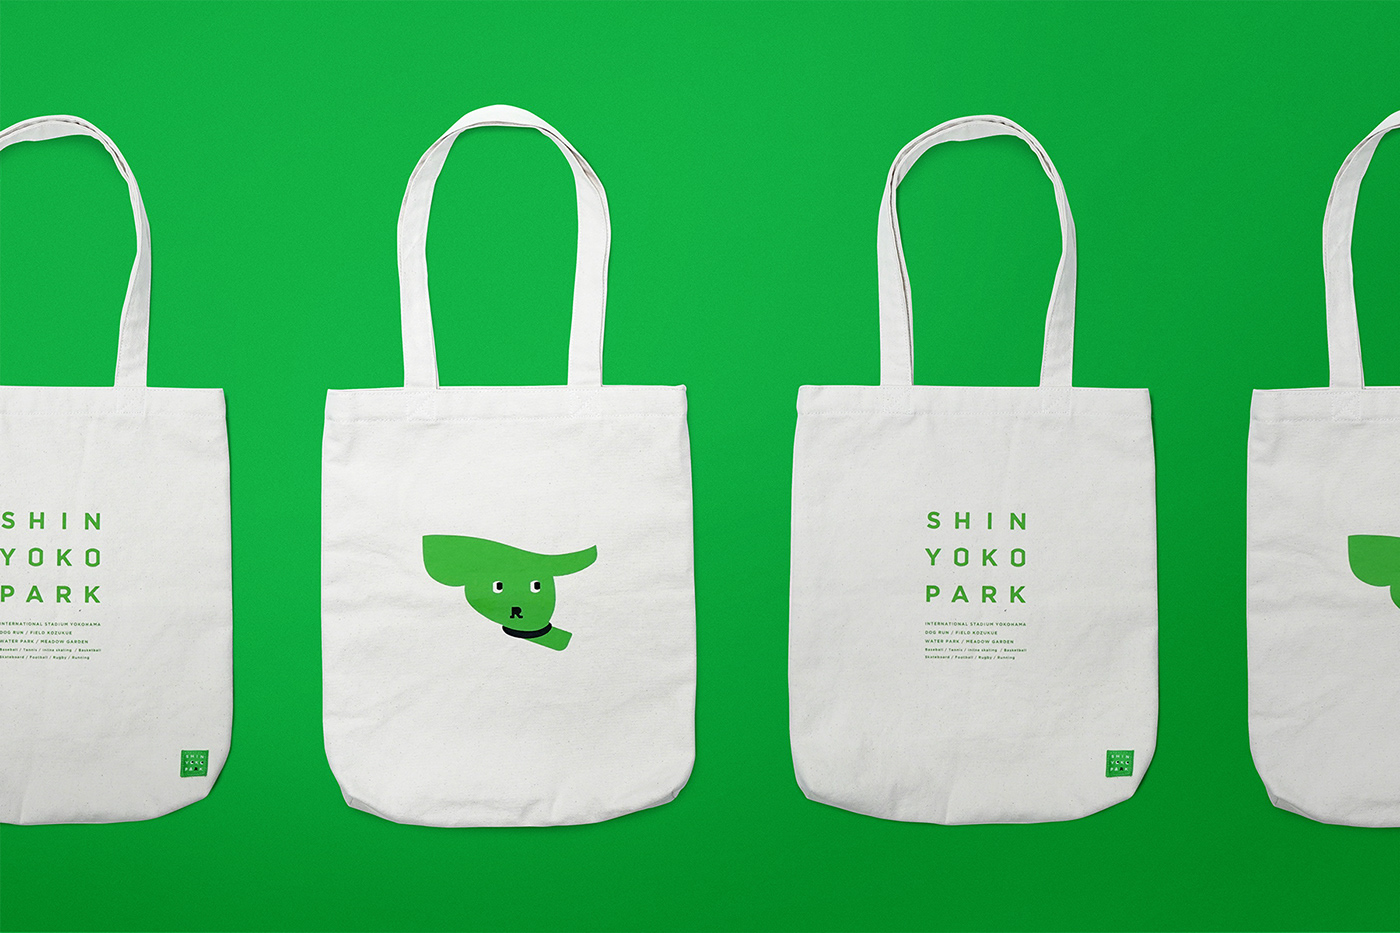 apparel bag branding  dog green Packaging Park stadium towel tshirt